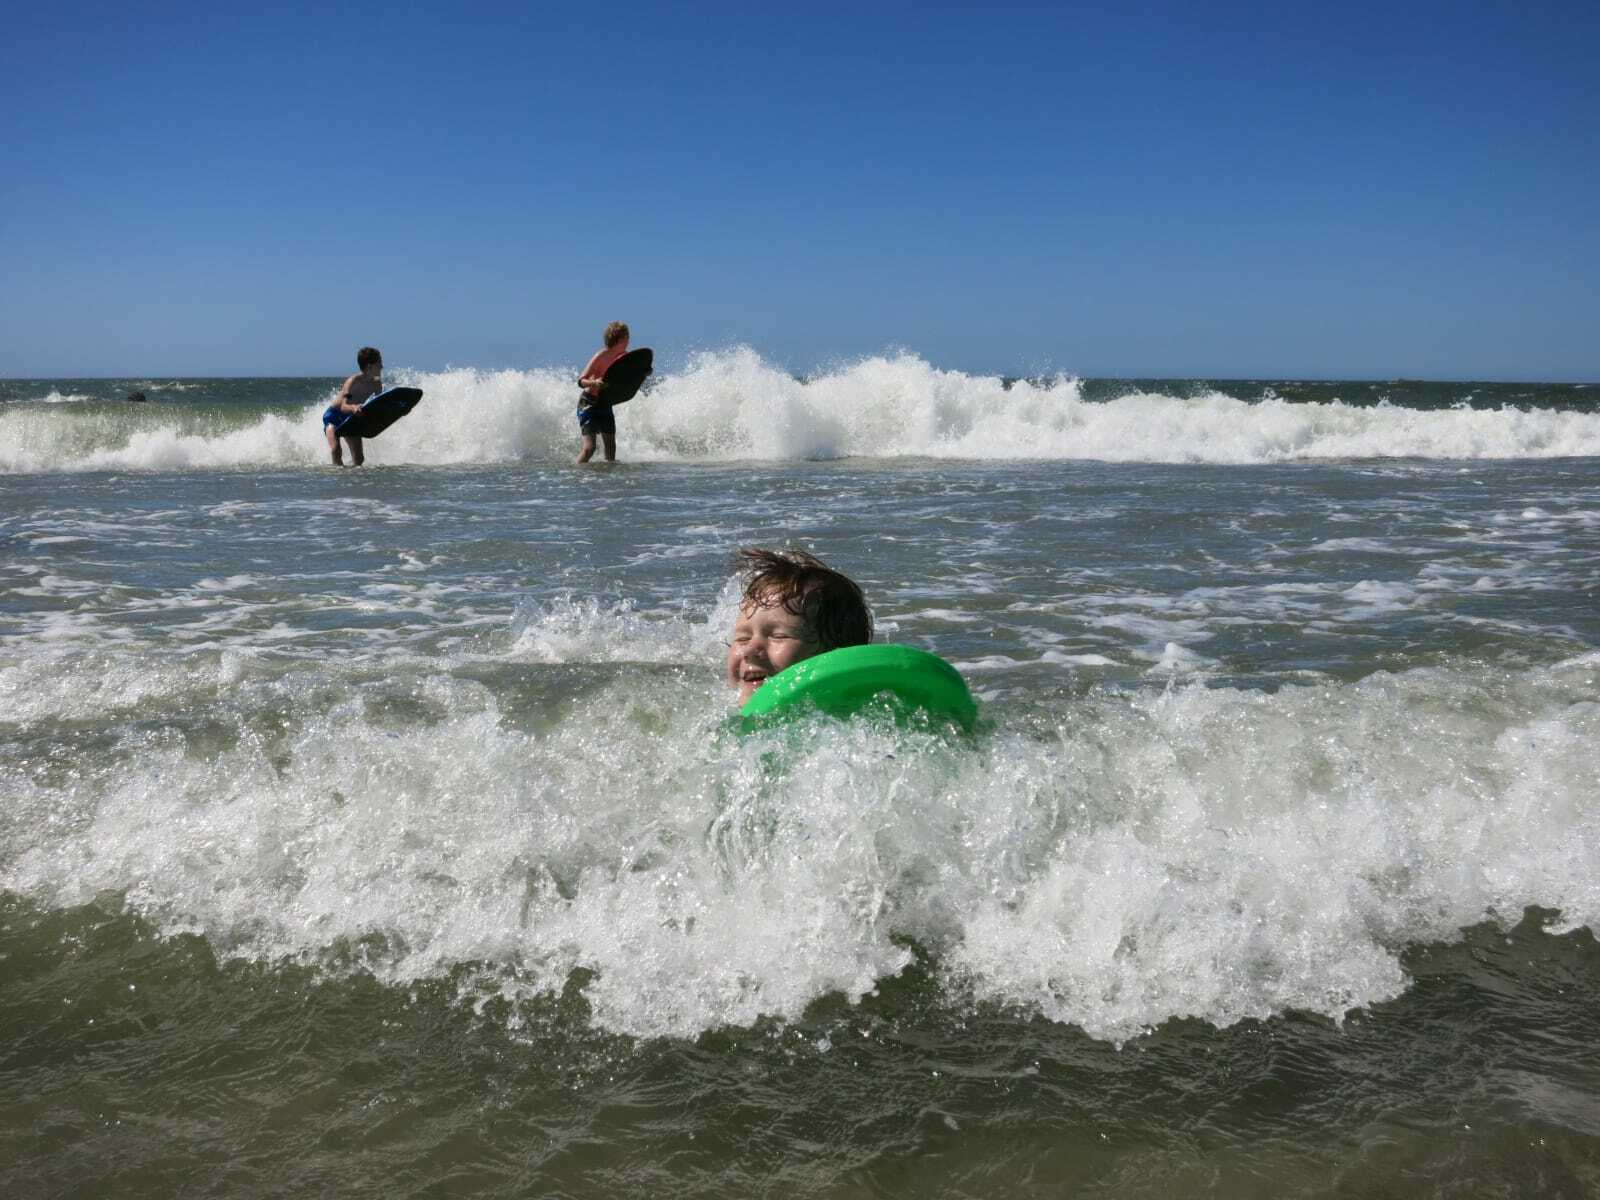 Kinderen zwemmen in zee fotograaf Annika Riedmann VVV Texel